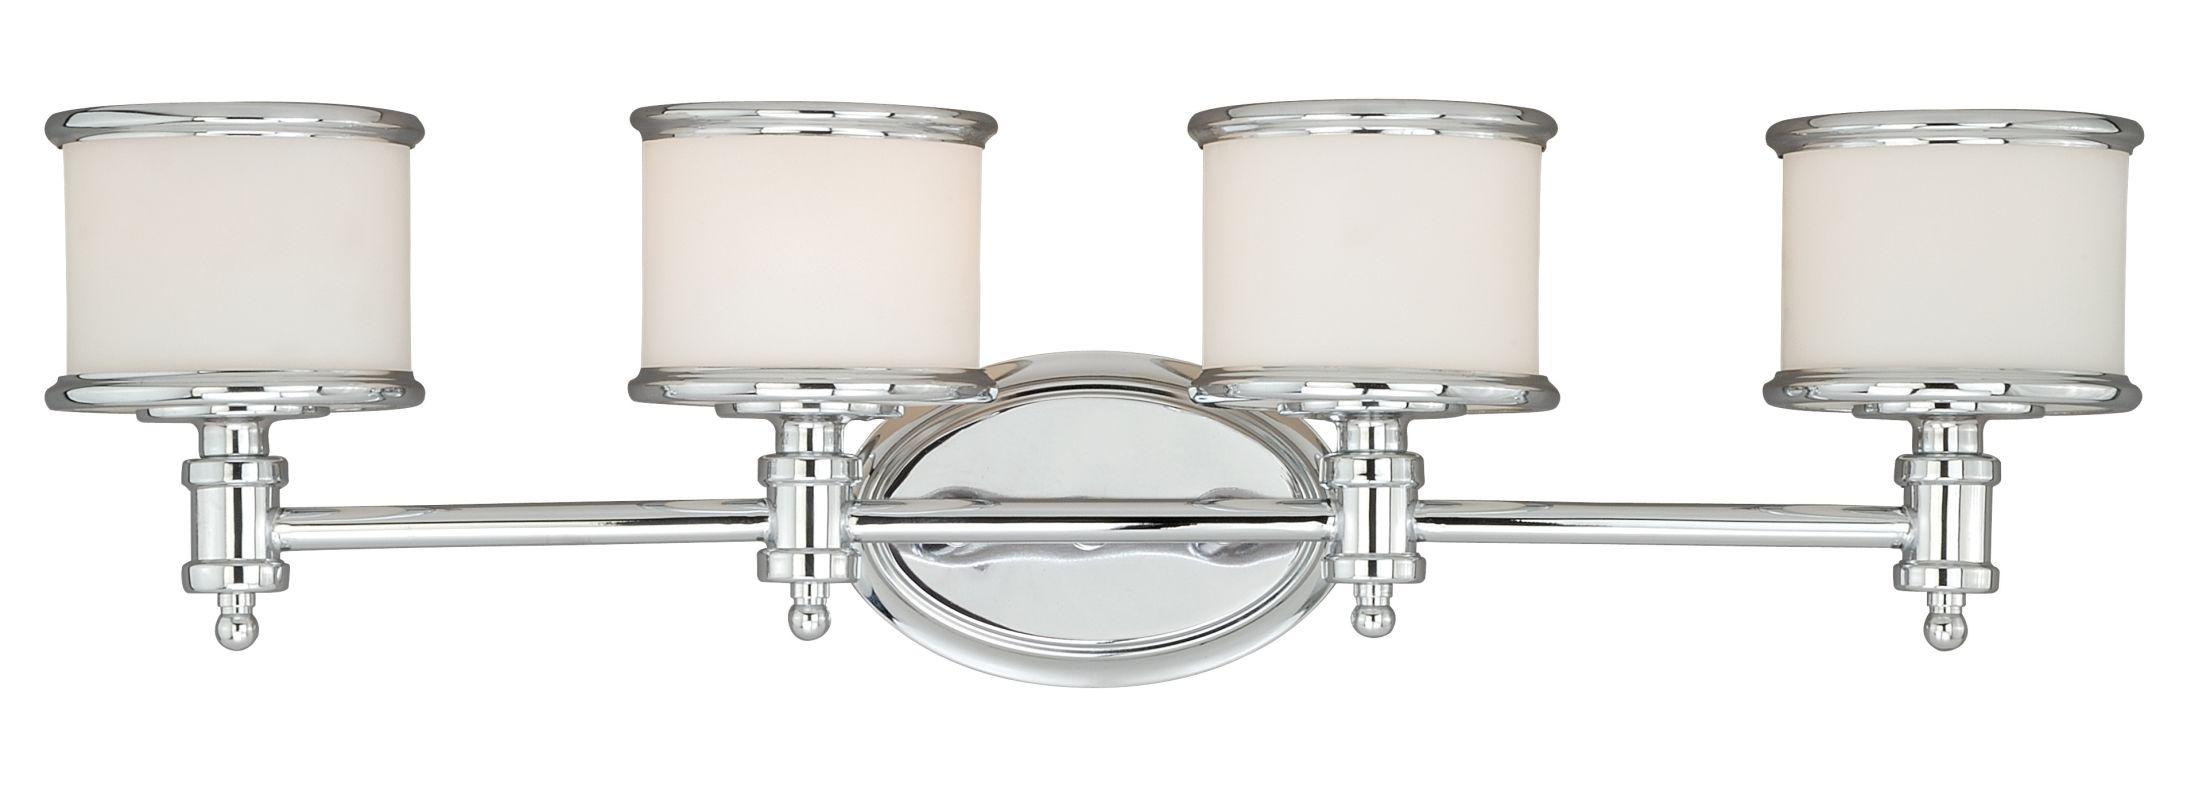 Vaxcel Lighting W0149 Carlisle 4 Light Vanity Light Chrome Indoor Sale $178.00 ITEM: bci2628375 ID#:W0149 UPC: 884656732870 :